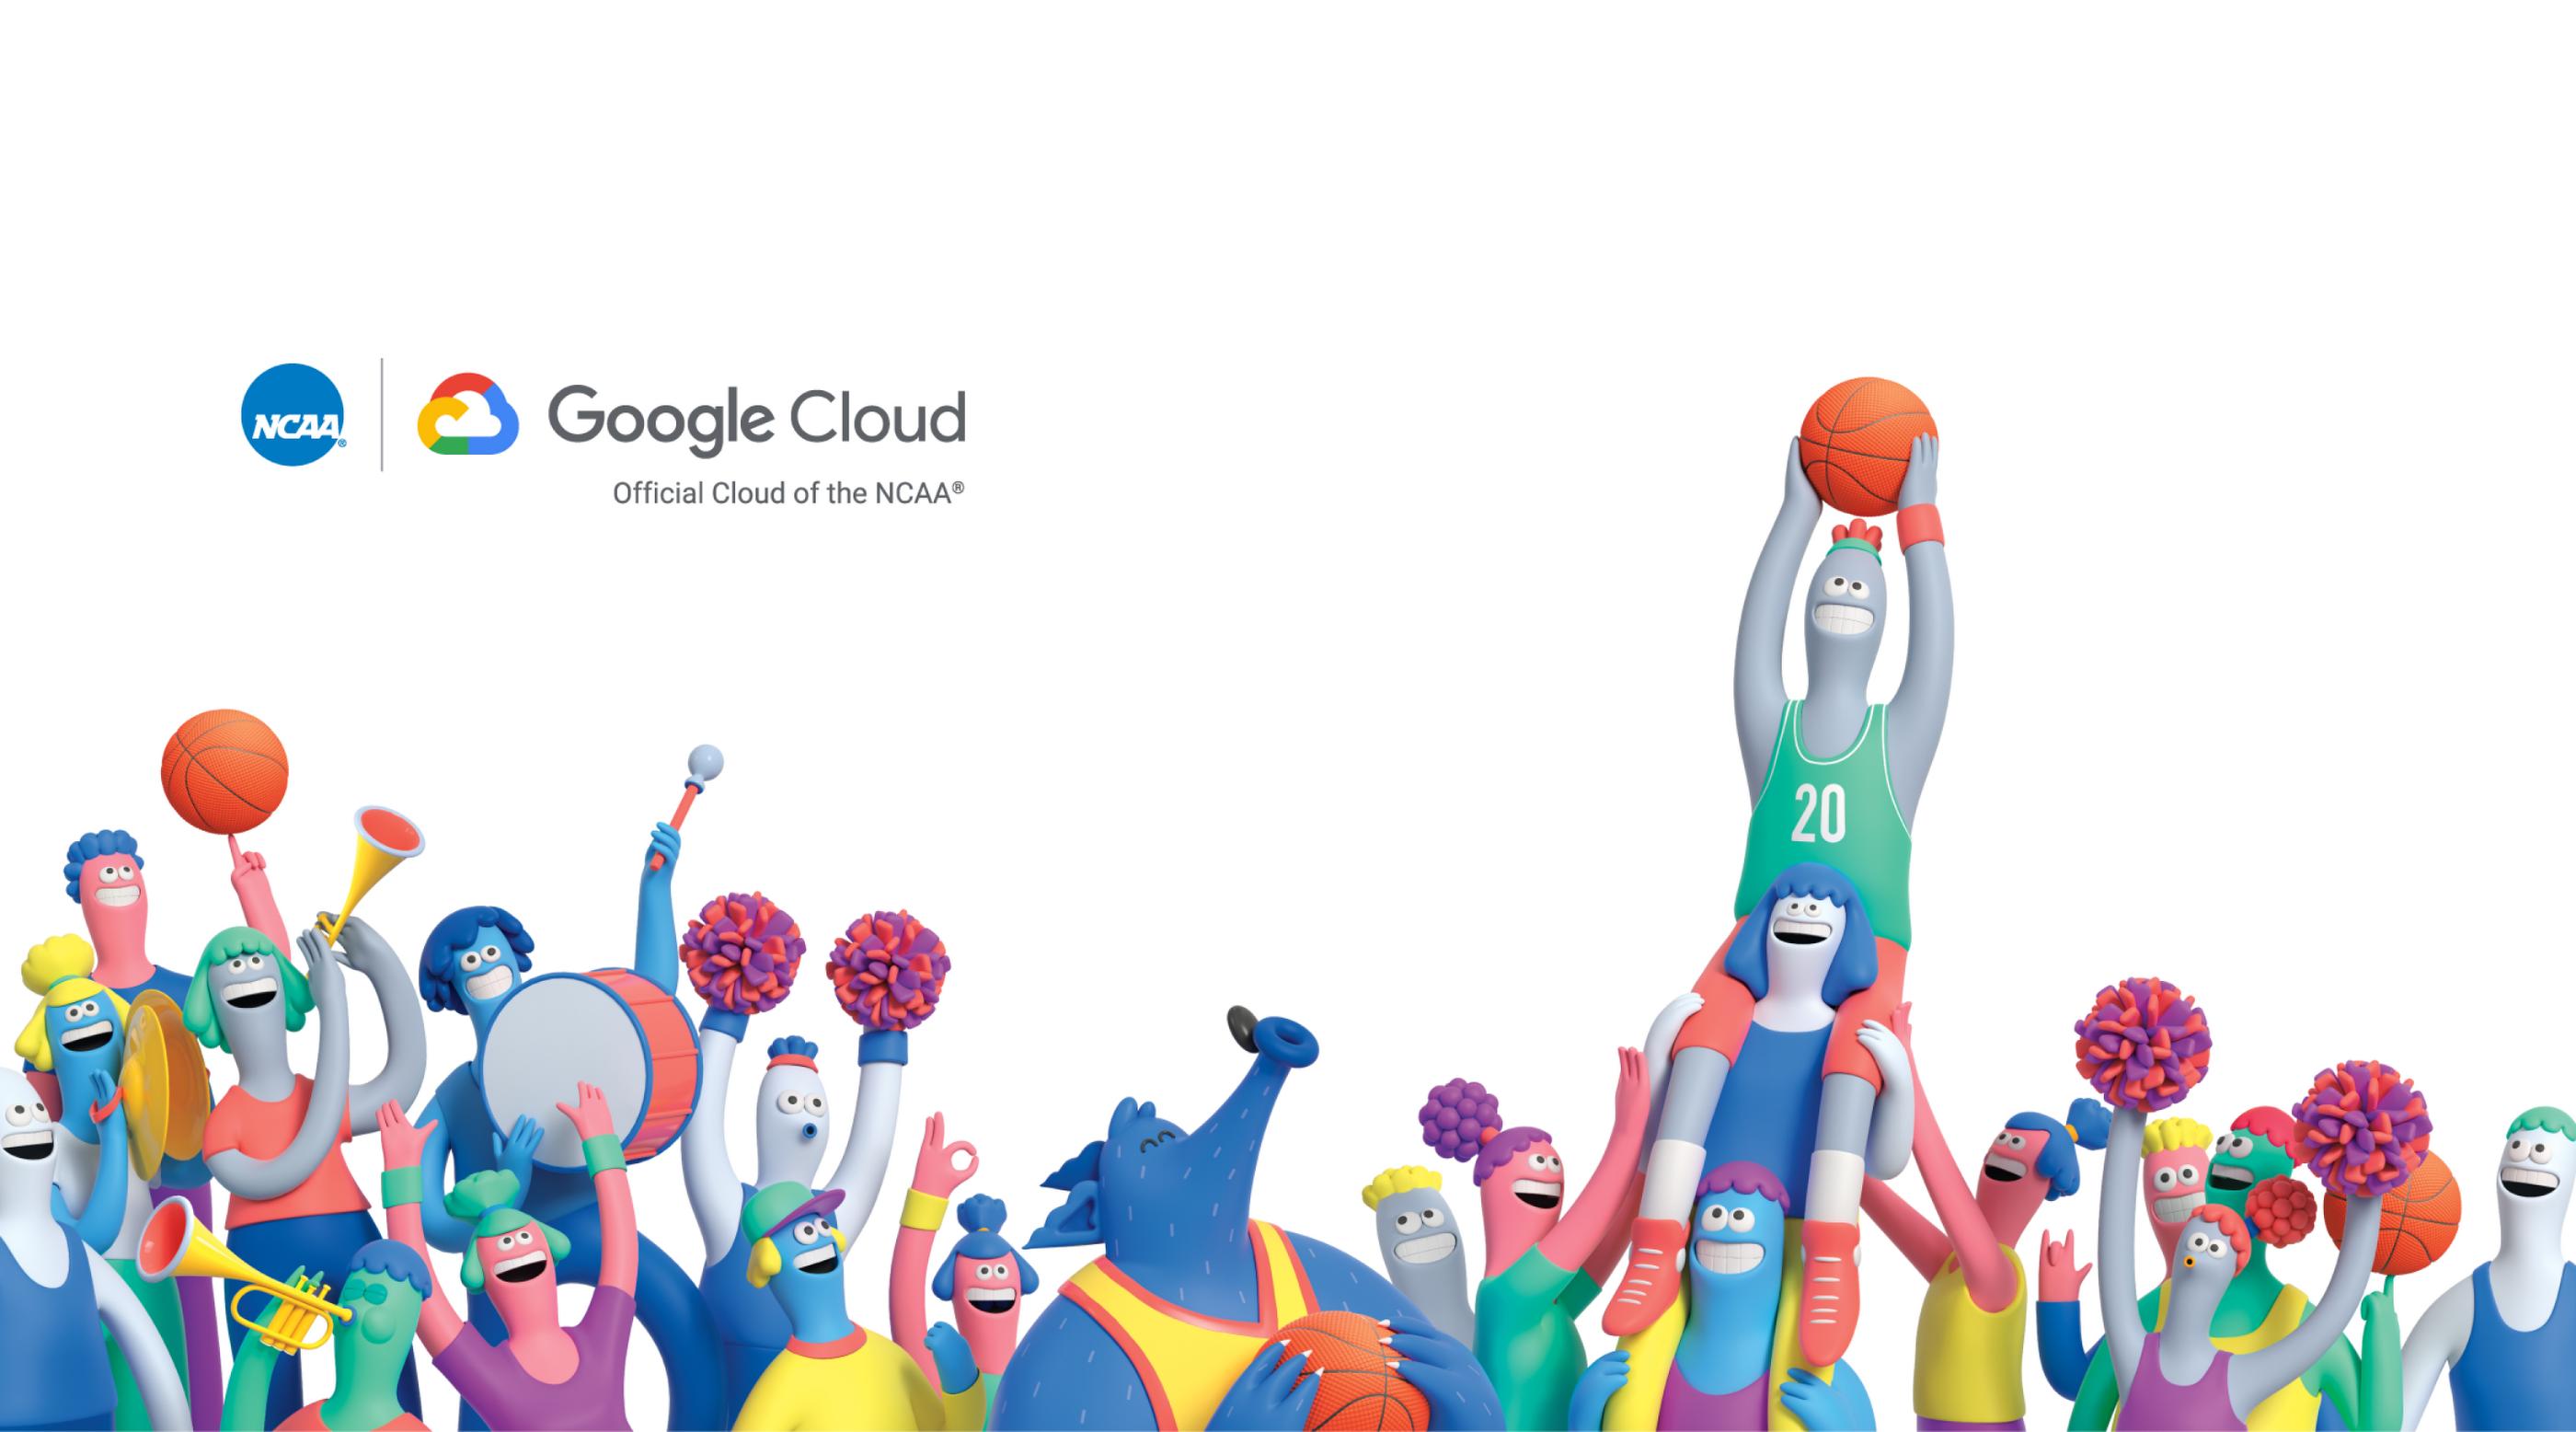 NCAA Google Cloud Final Four